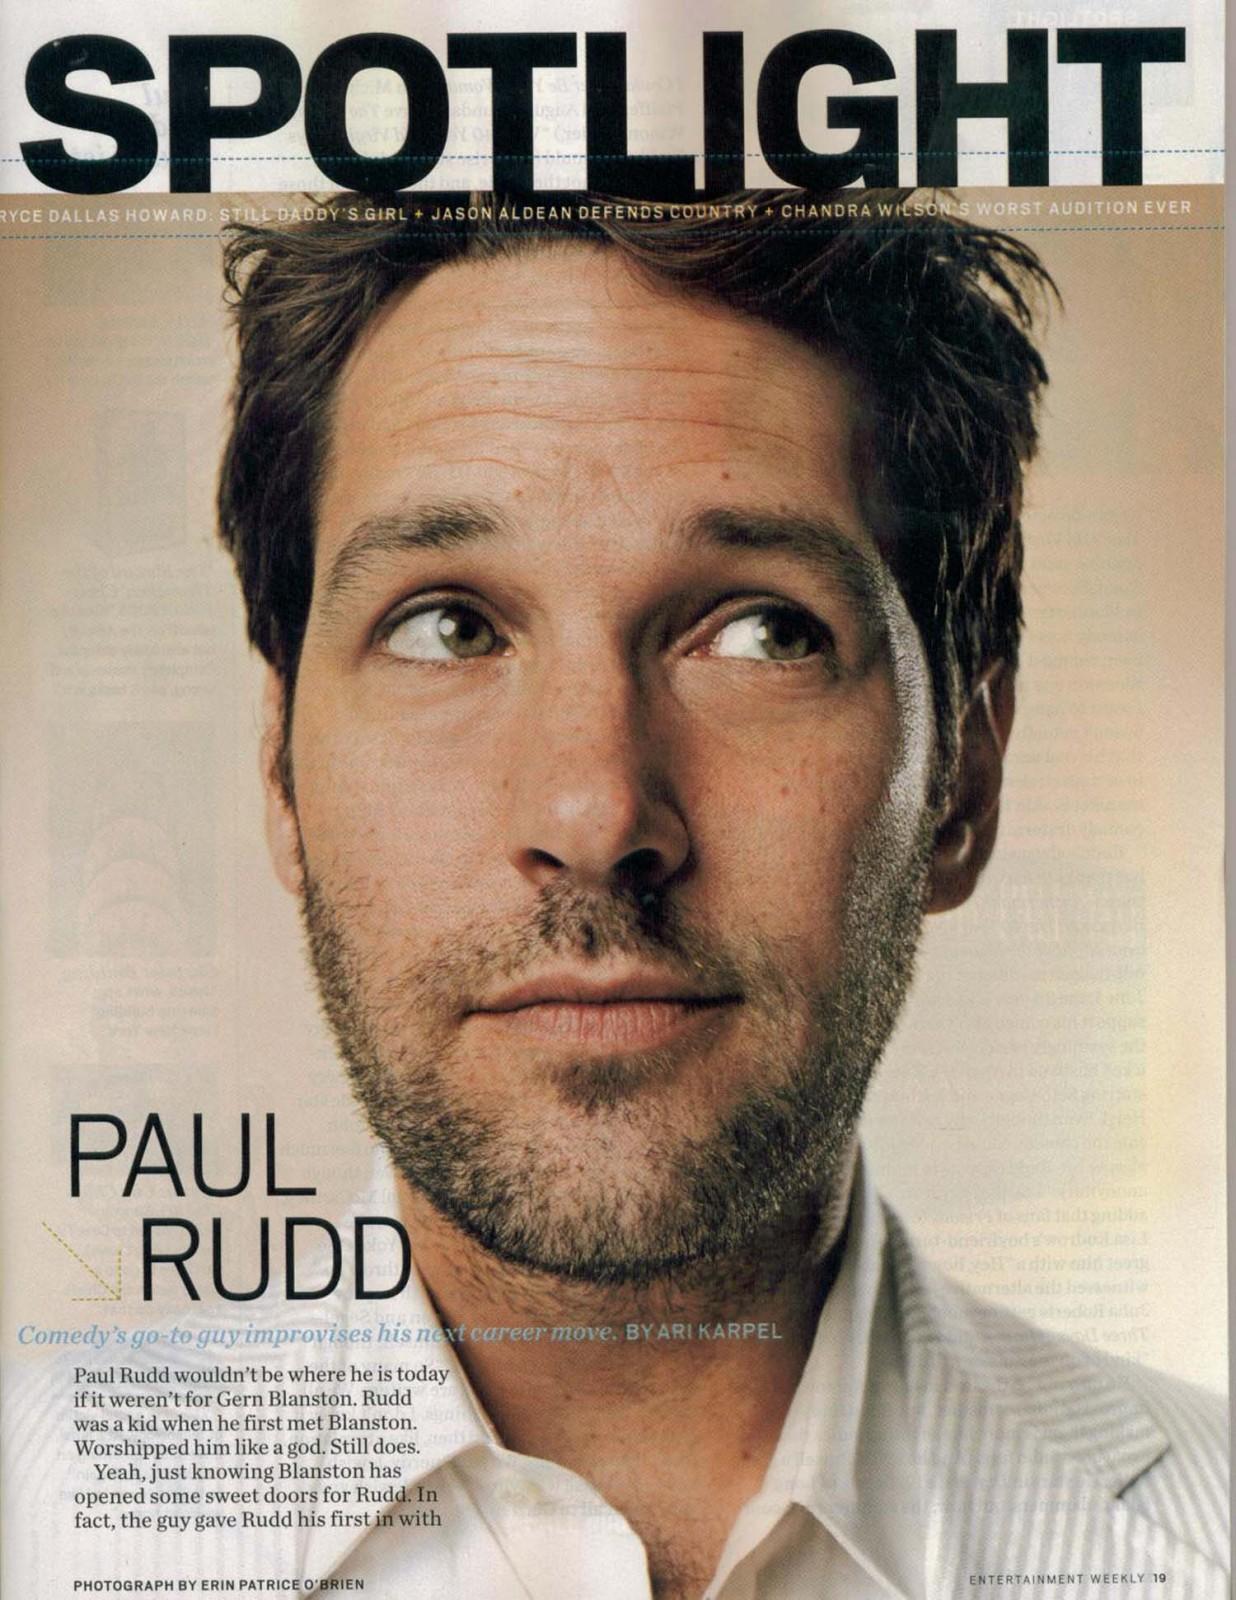 Paul Rudd Paul Rudd 418117_1236_1600jpg